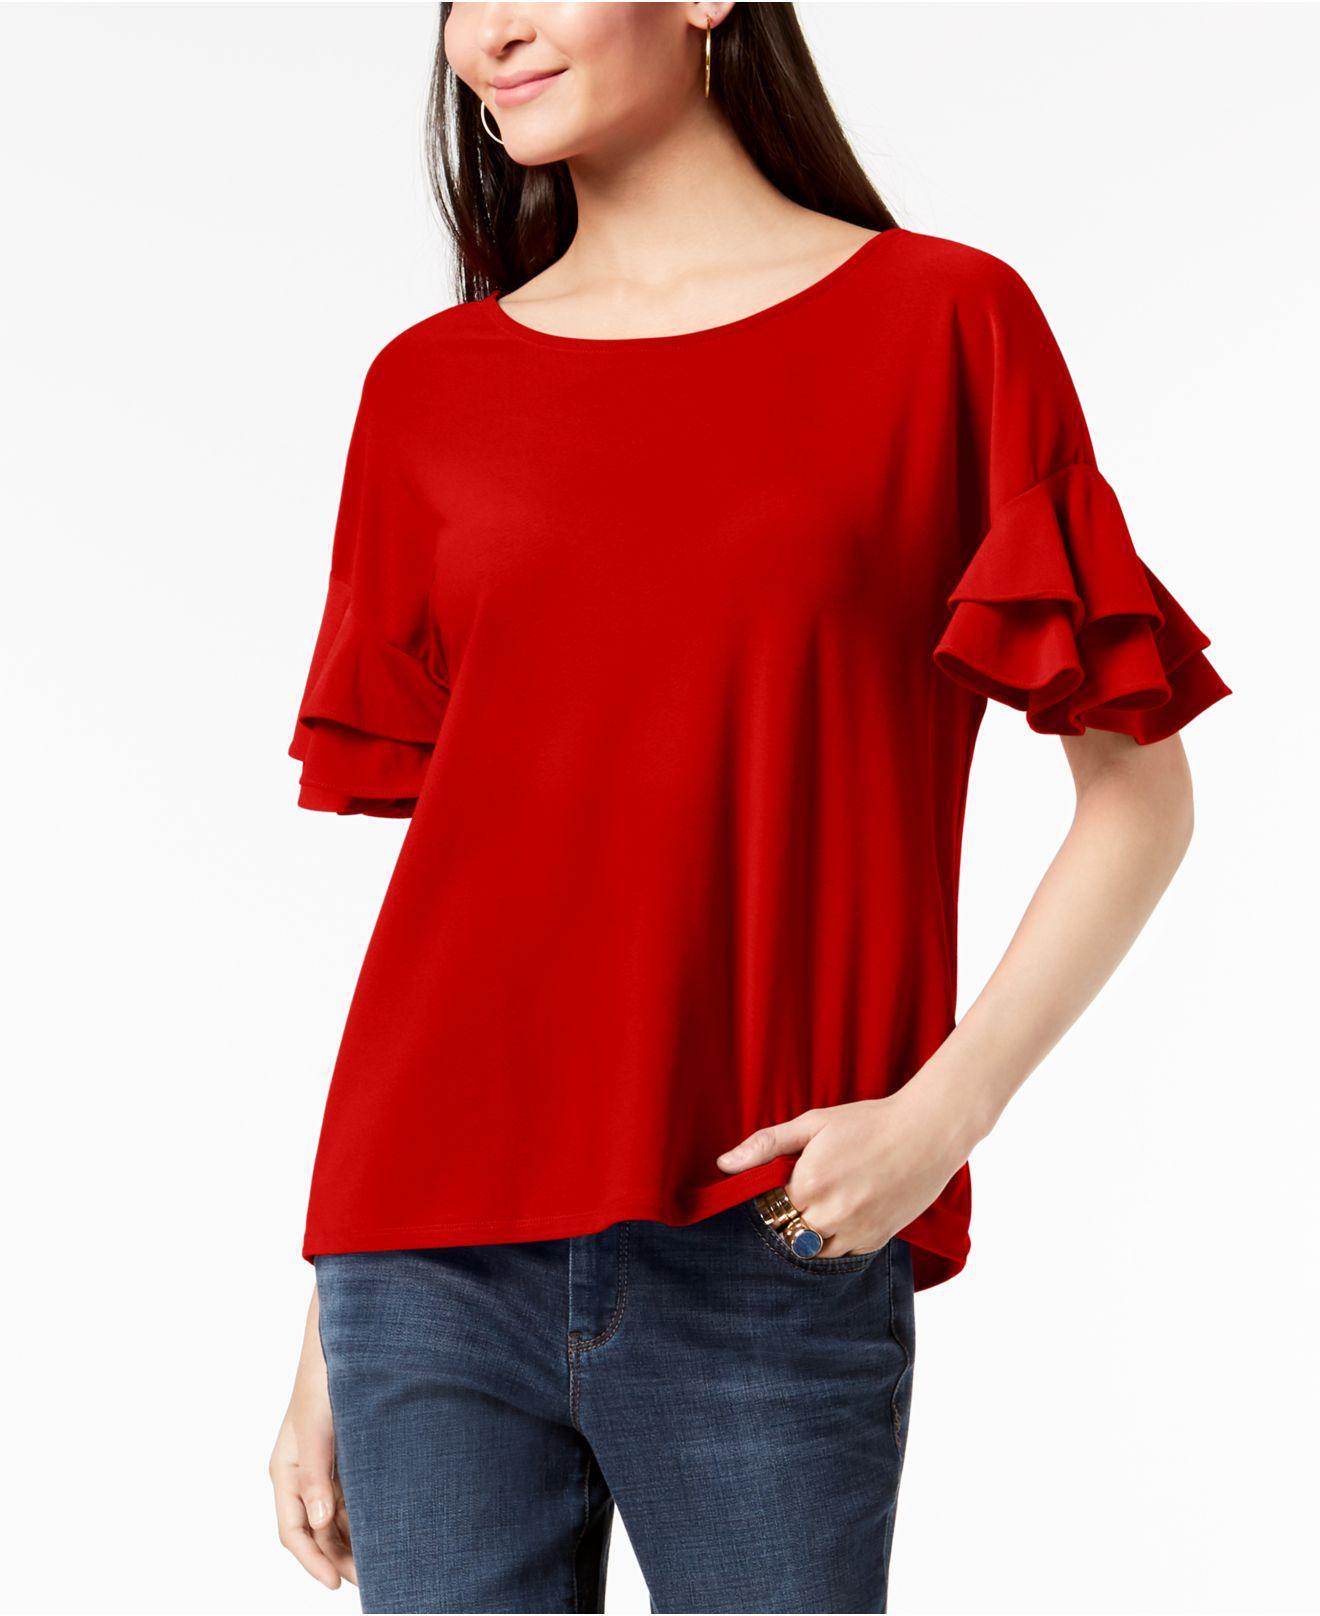 bb456033844e1 INC International Concepts. Women s Red I.n.c. Ruffled-sleeve Top ...